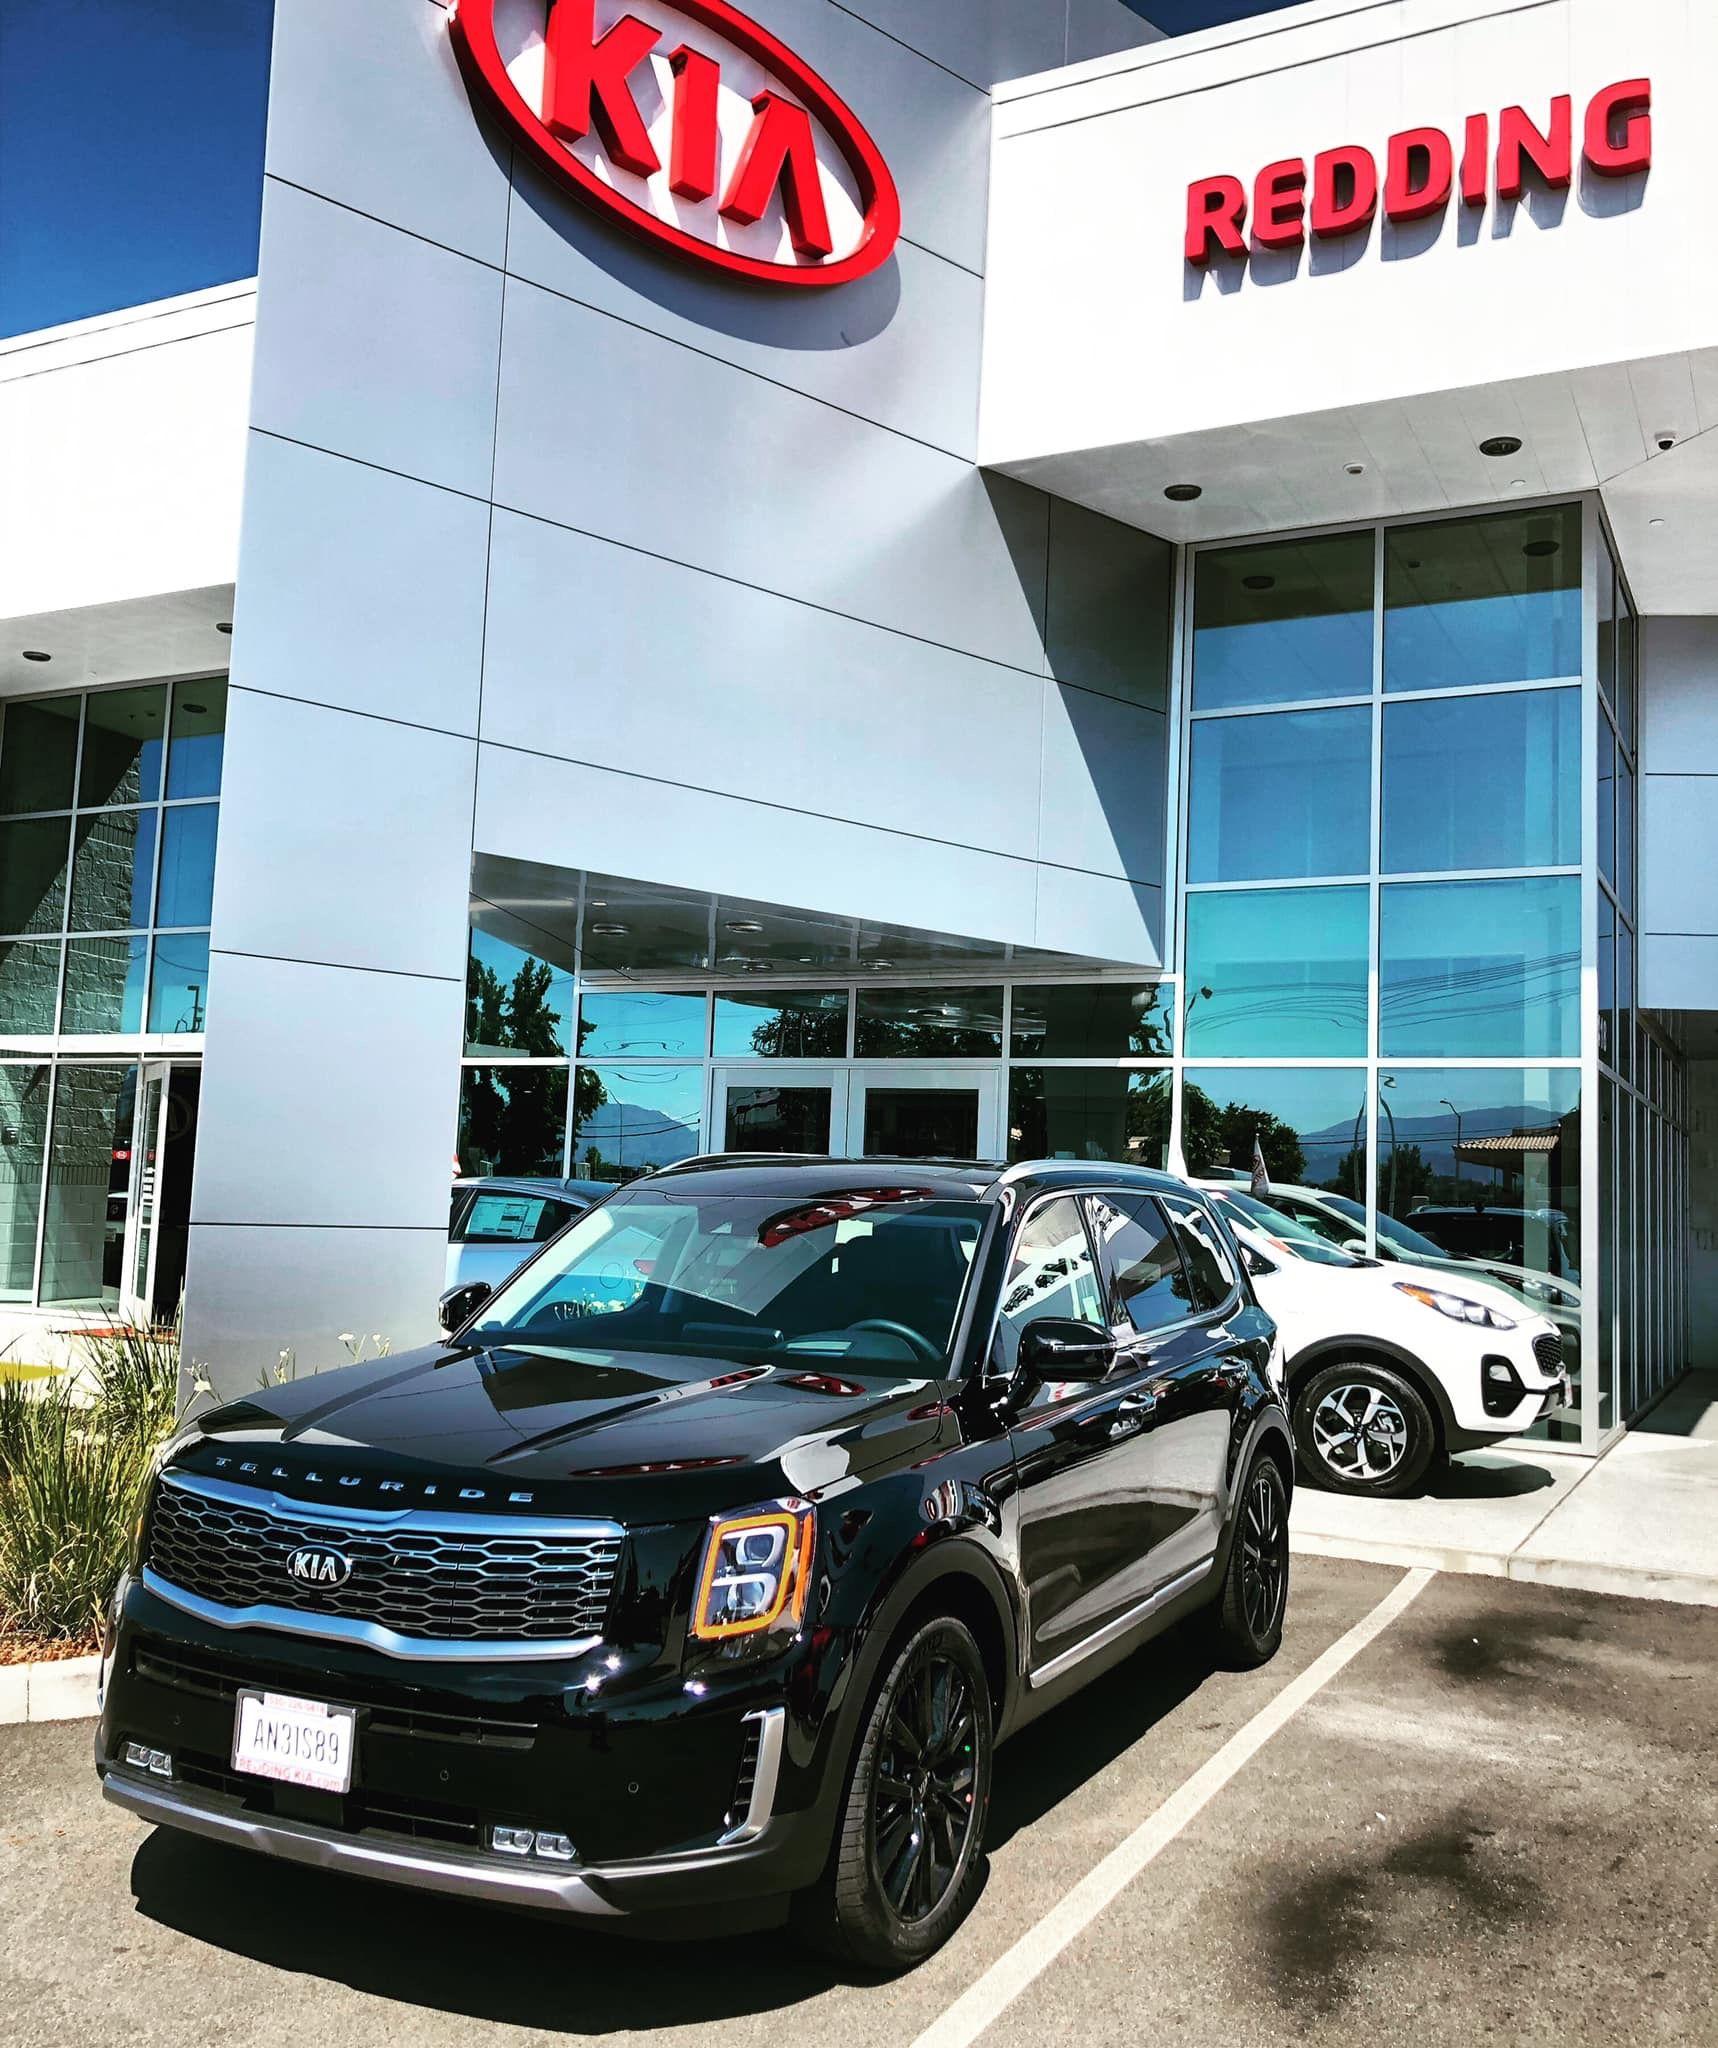 Congratulations To Mr Jean Patenaude On The The Purchase Of His 2020 Kia Telluride Sx With Prestige Package Awd Reddingkia Kia Ki Kia Telluride New Cars